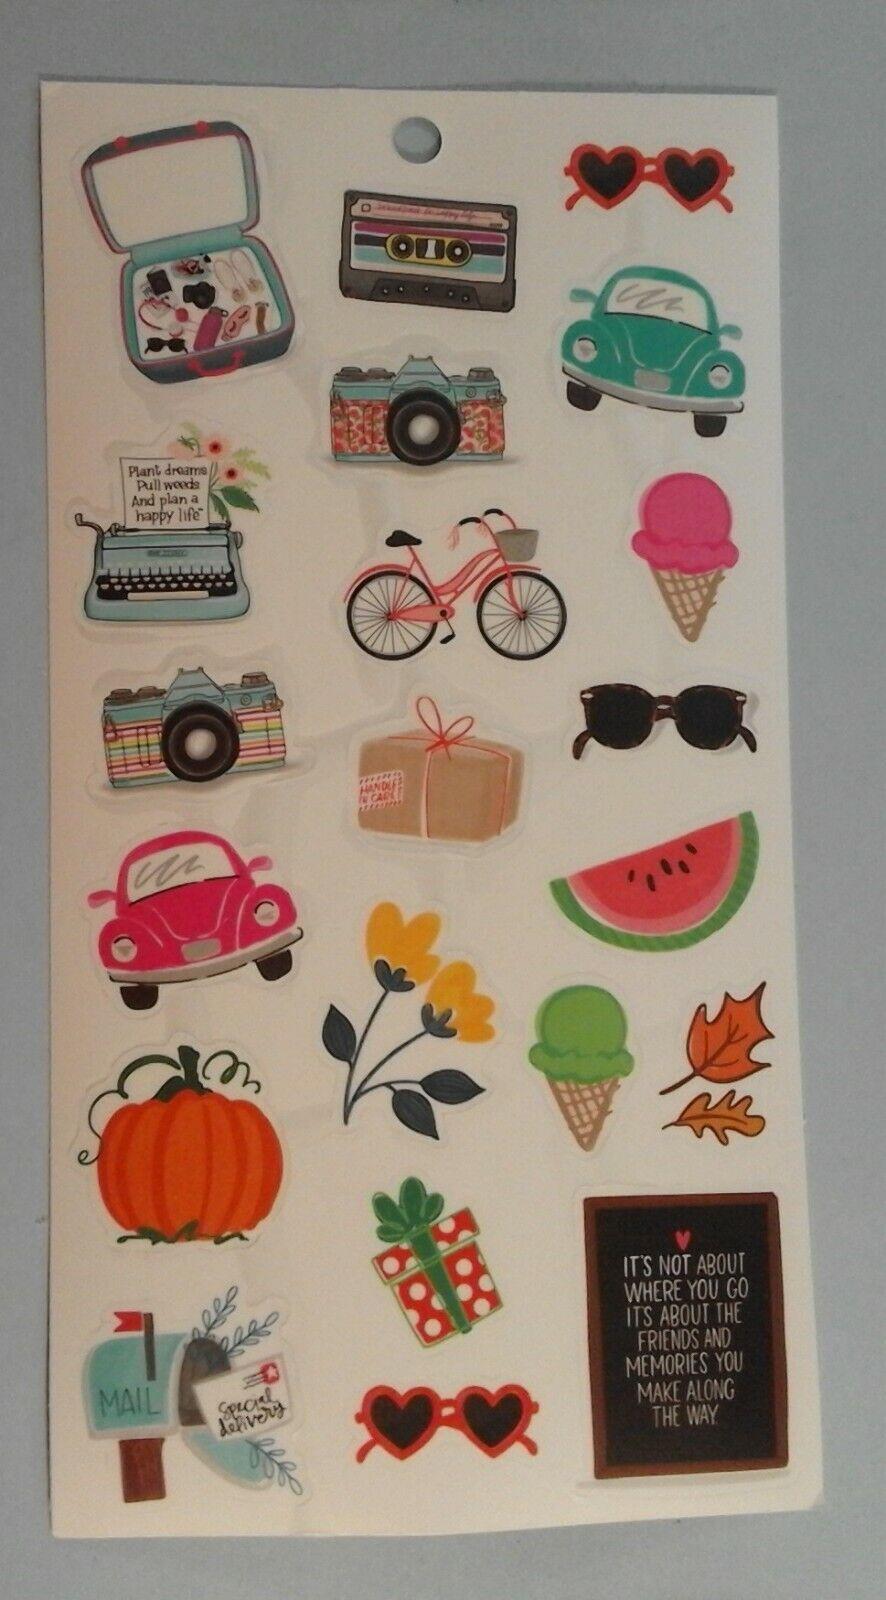 Happy Planner Luggage Camera Car Ice Cream Flower Pumpkin MAMBI Stickers 262067 - $1.00